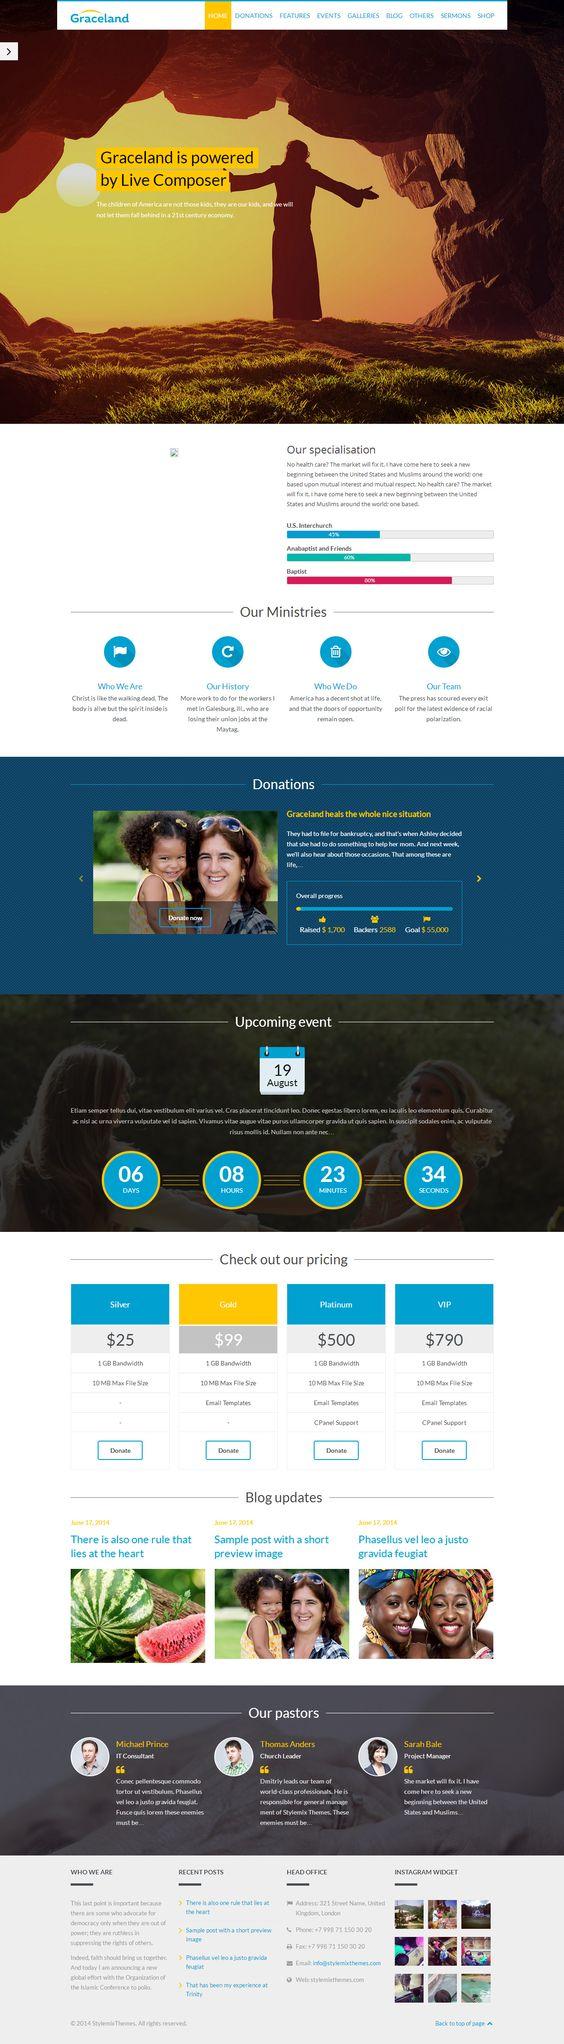 Graceland is Premium full Responsive Retina Parallax WordPress Church theme. WooCommerce. Video Background. Visual Composer. http://www.responsivemiracle.com/cms/graceland-premium-responsive-church-wordpress-theme/